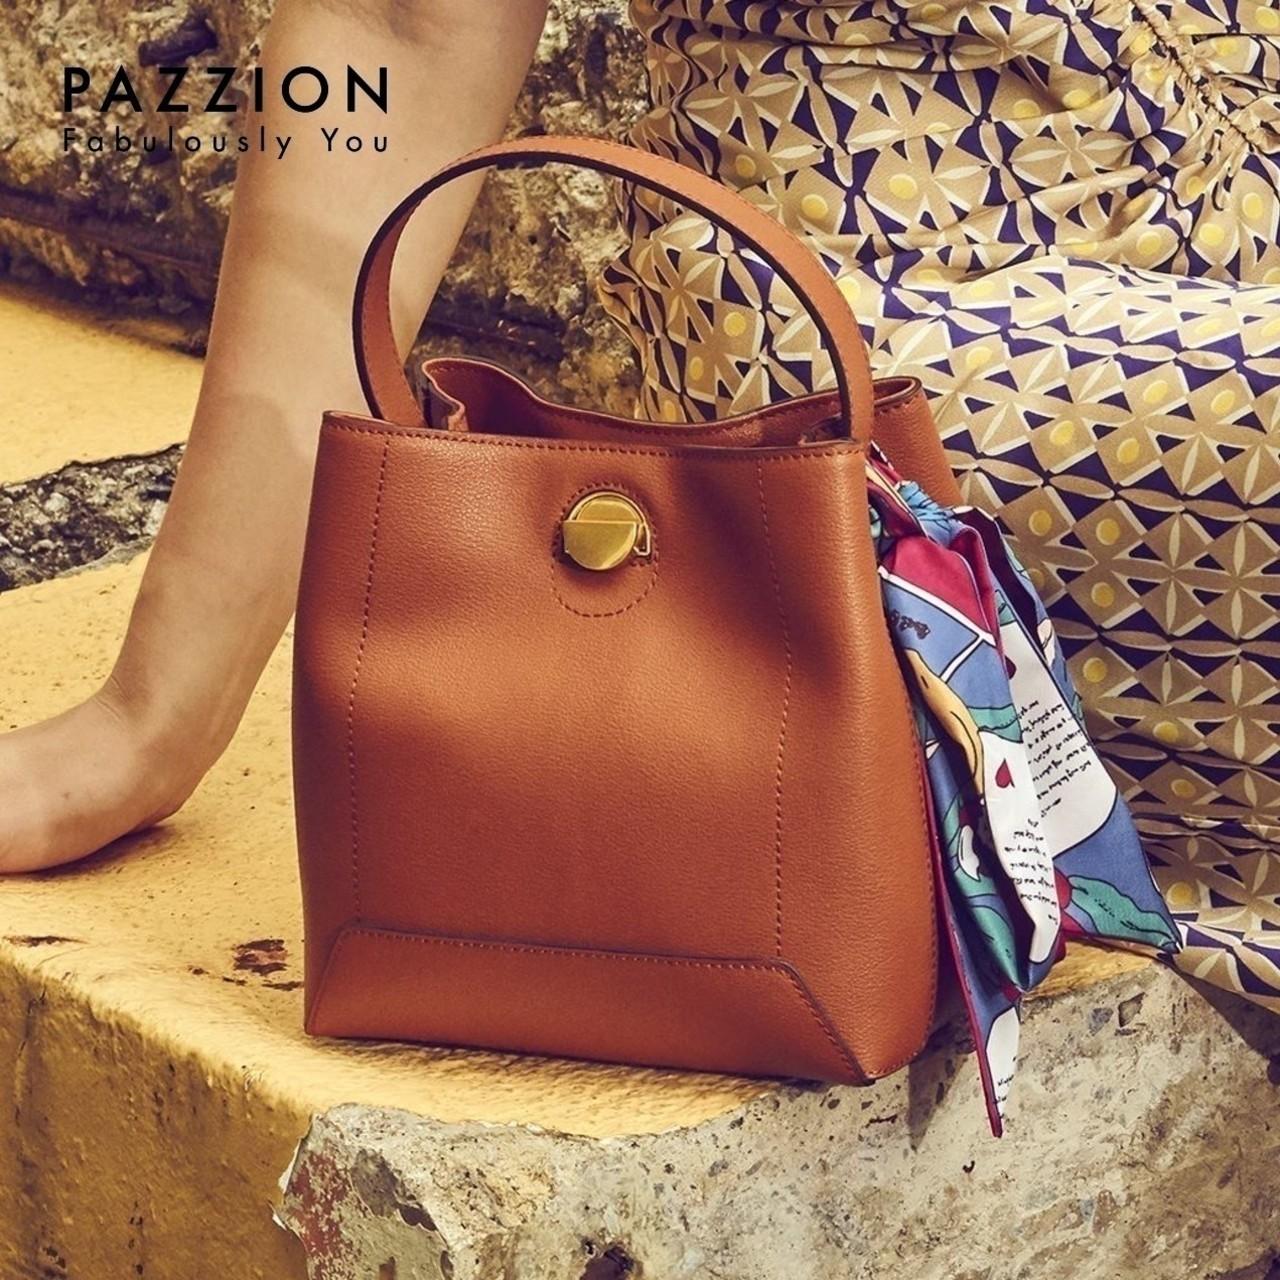 PAZZION2019新款欧美时尚印花挂巾单根手提包 拉链袋磁扣水桶包